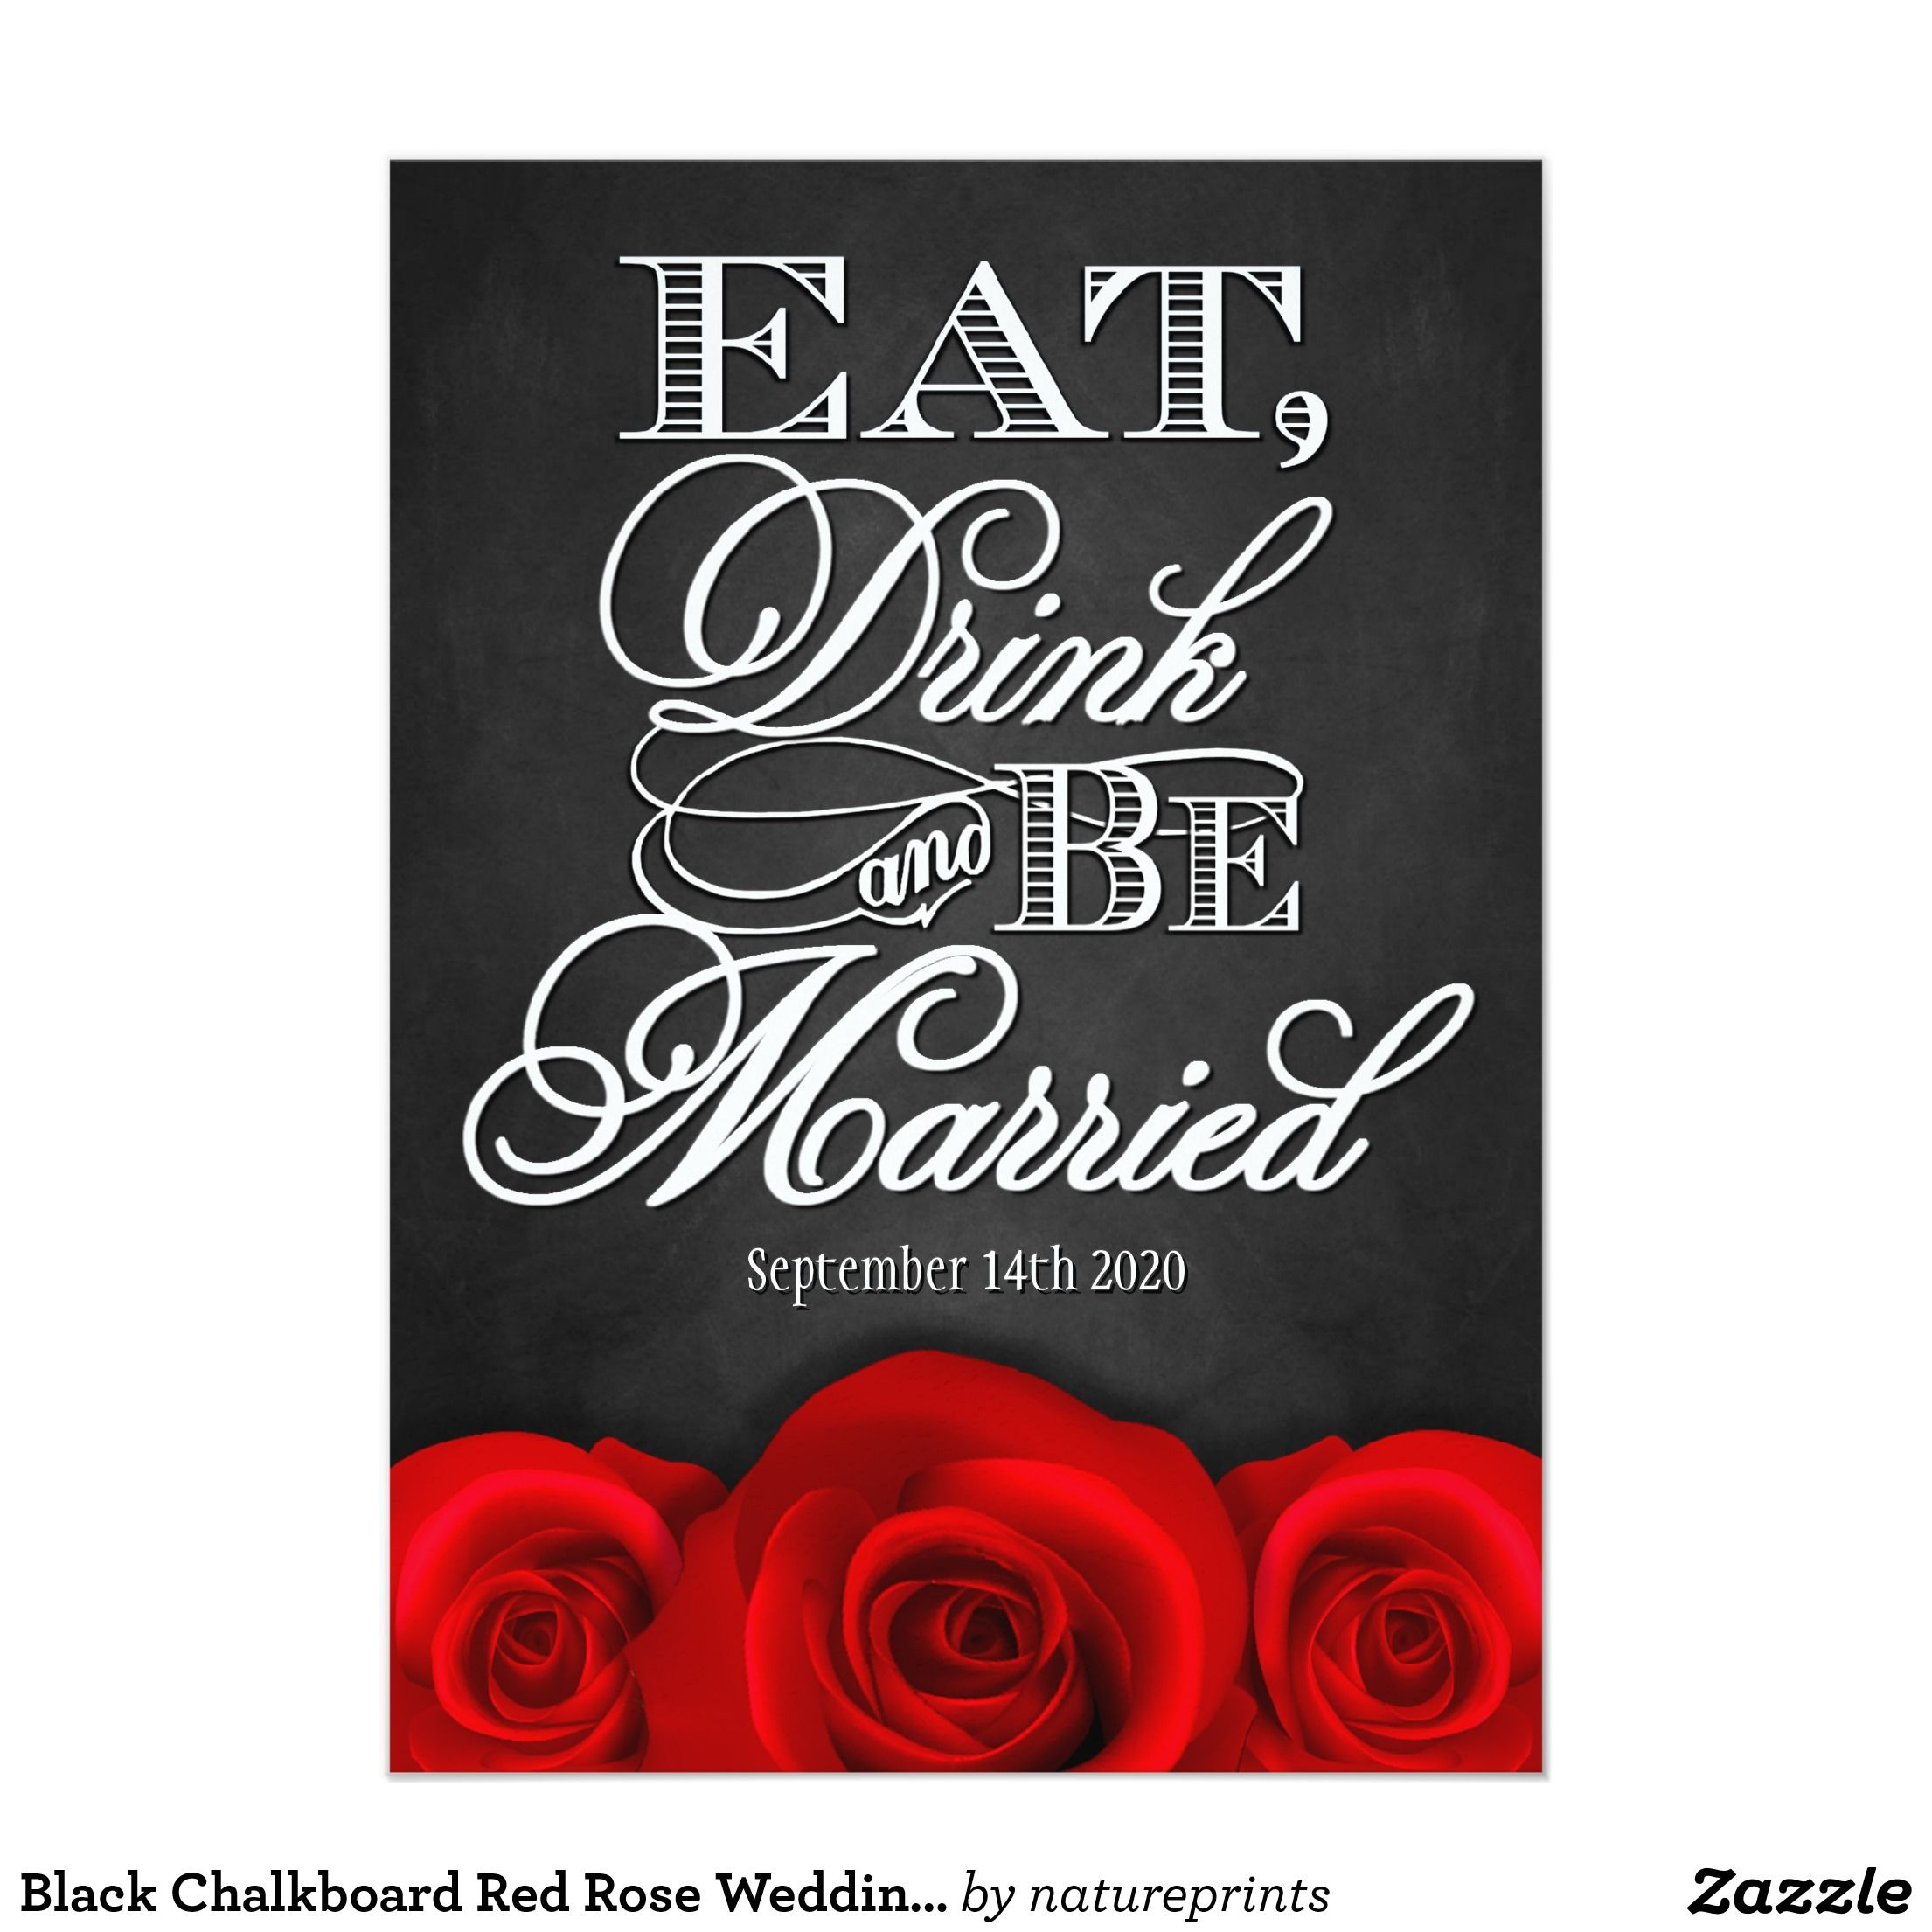 Black Chalkboard Red Rose Wedding Invitations   Black chalkboard ...